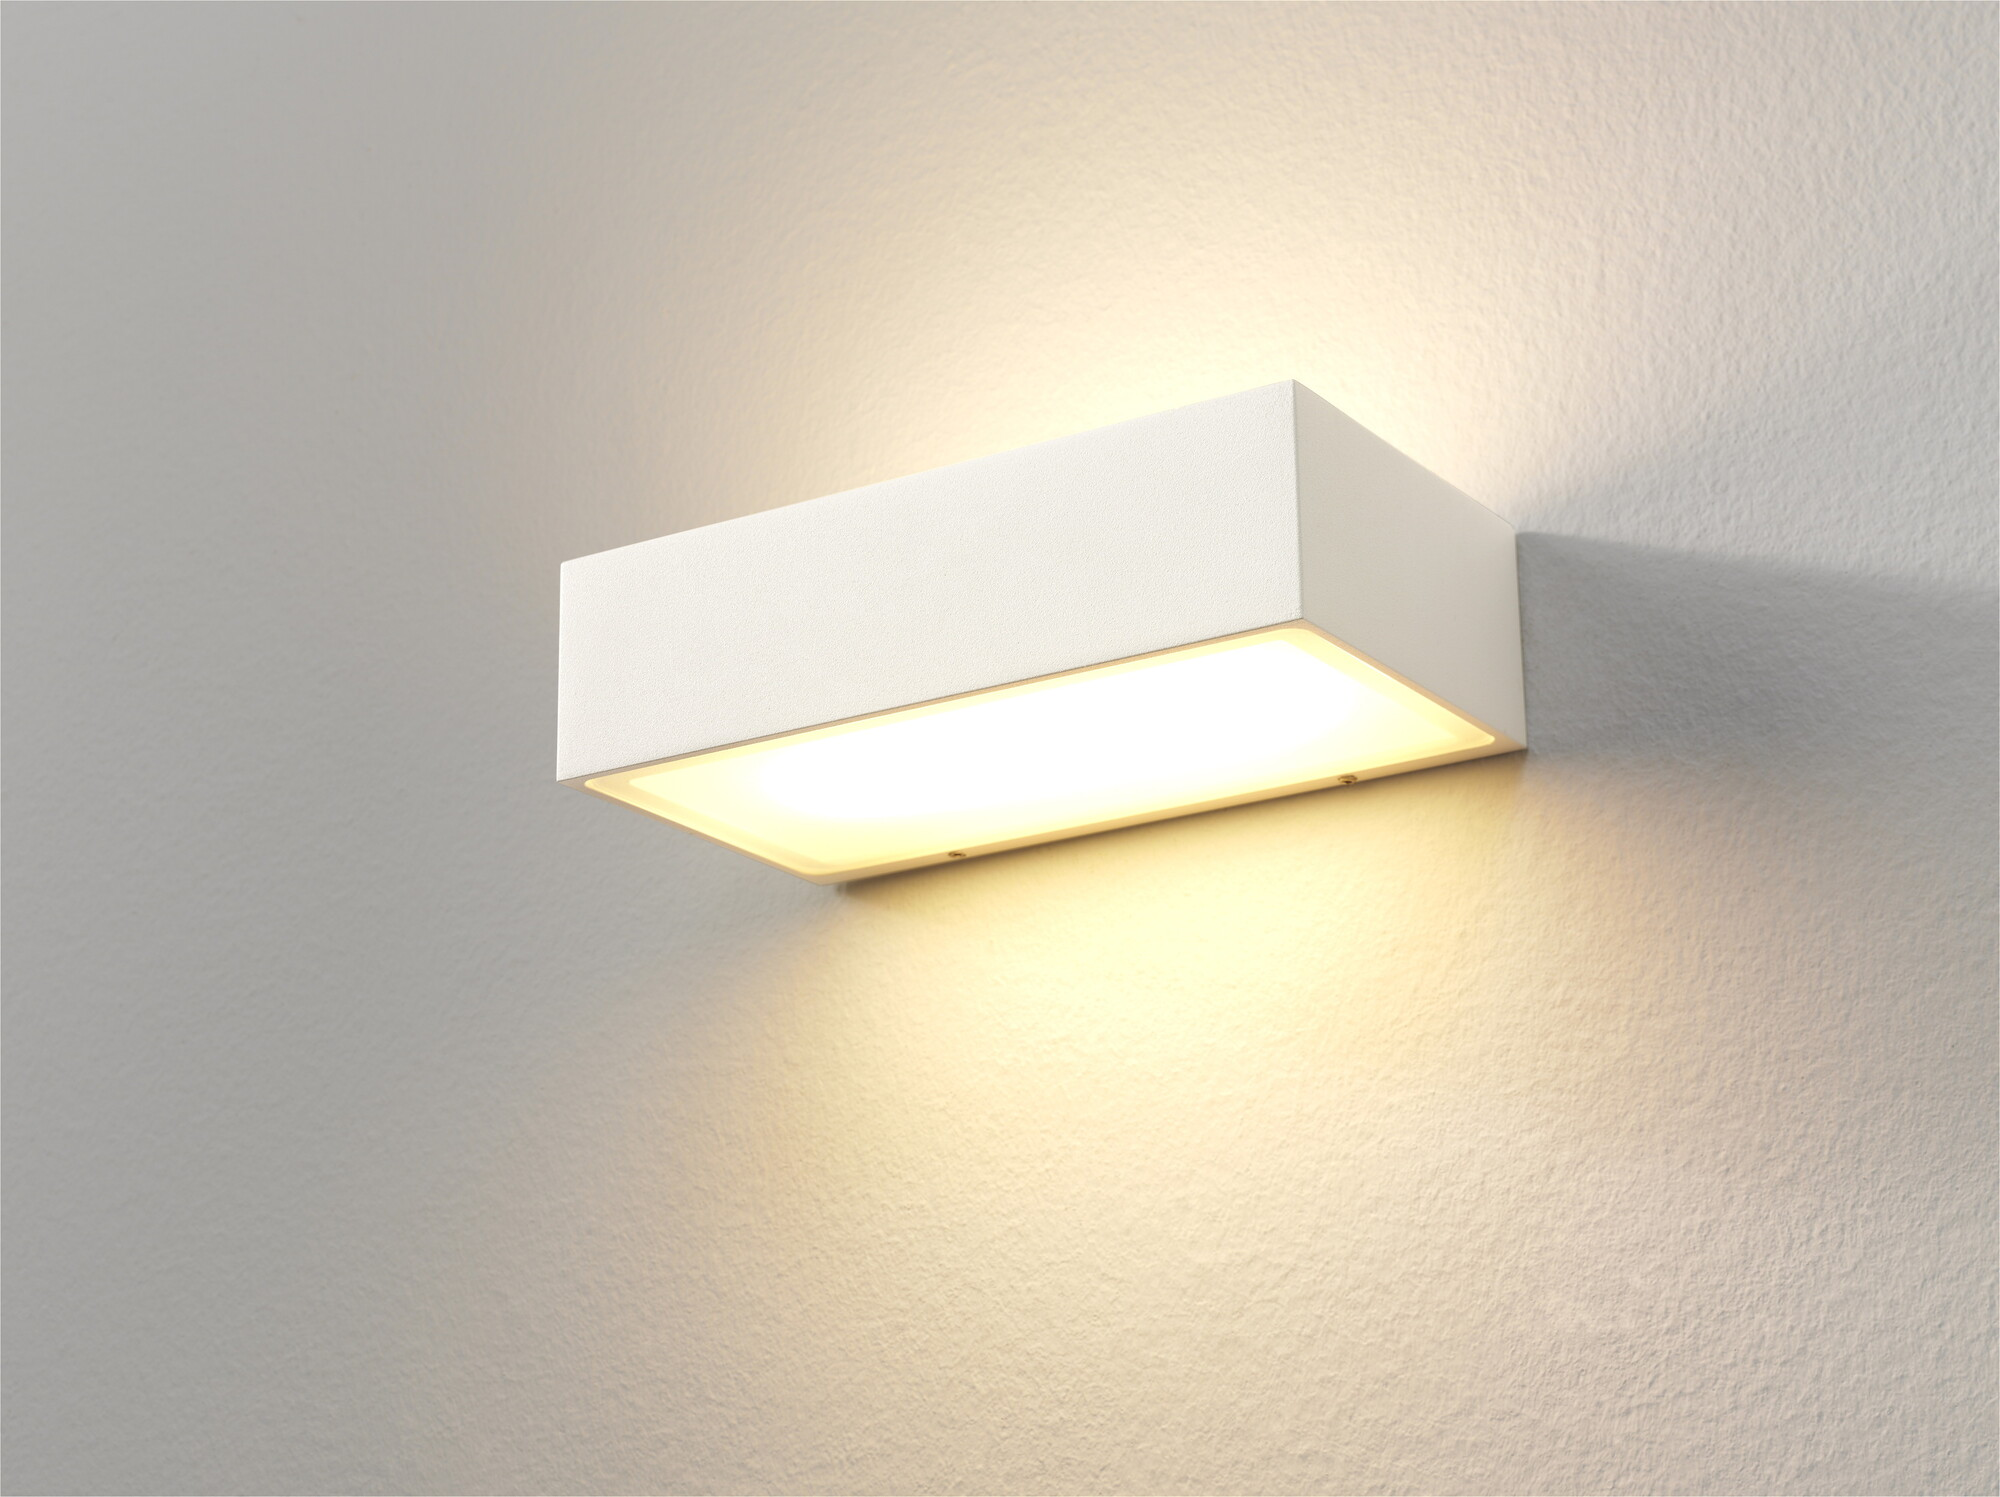 EINDHOVEN Wandlamp LED 2x8W/720lm Rechthoekig Wit